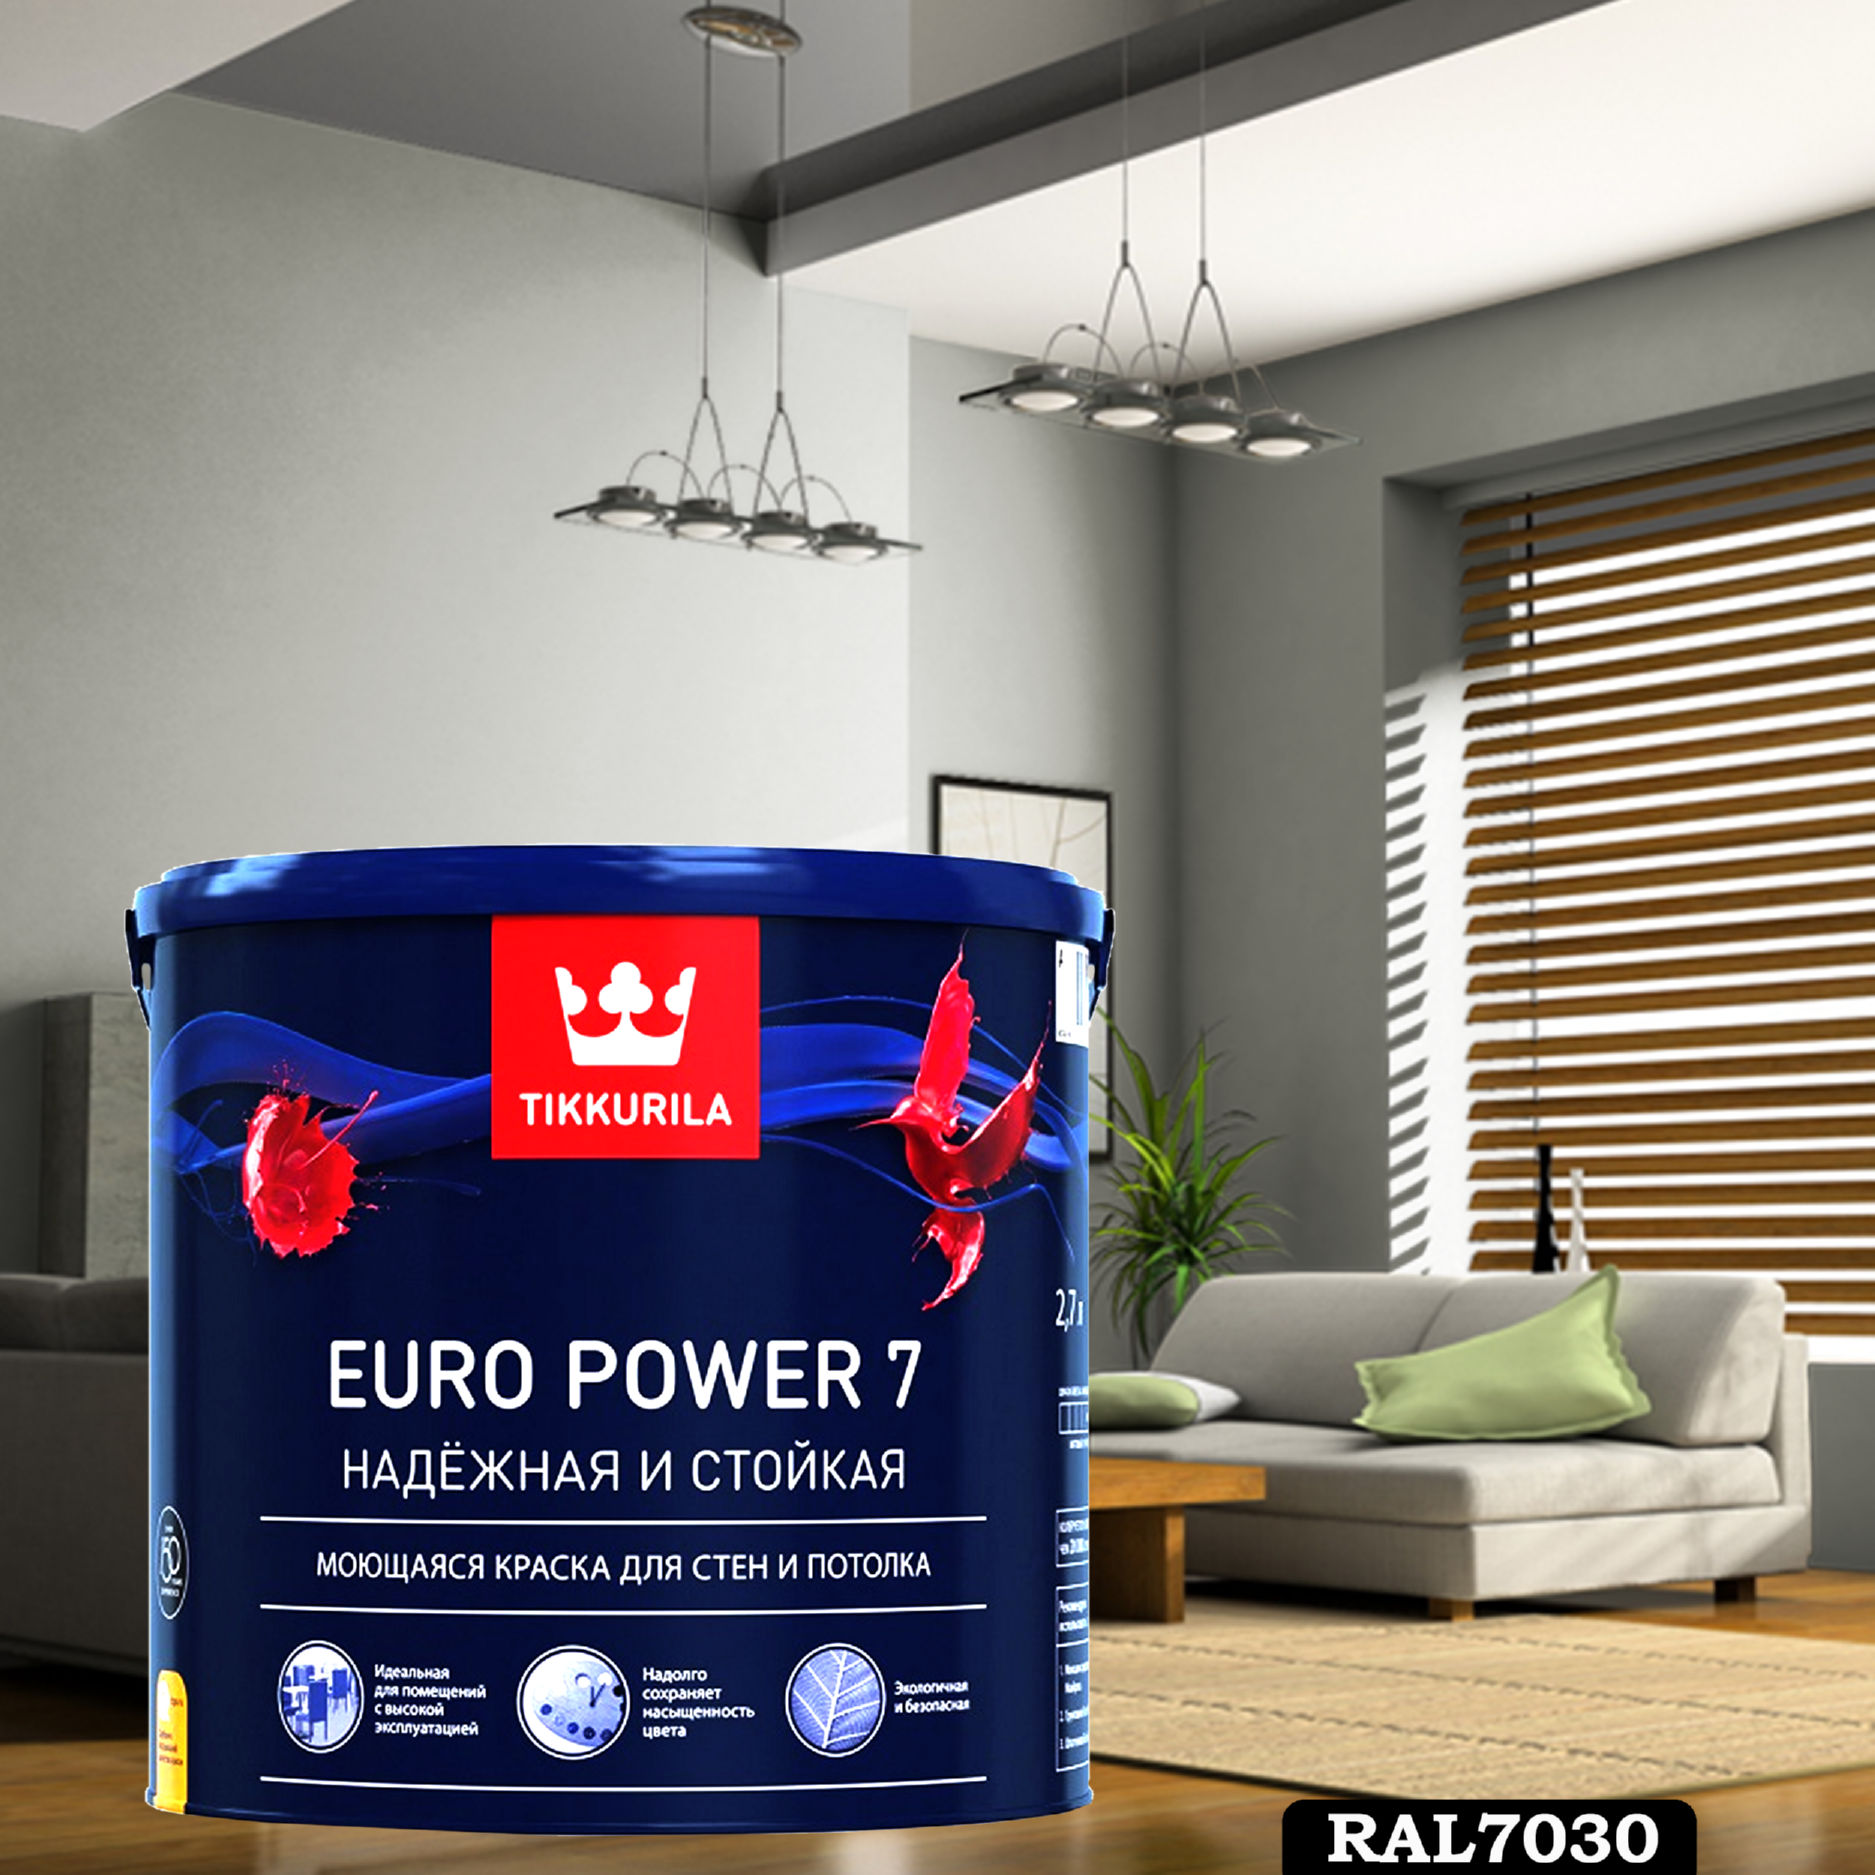 Фото 21 - Краска TIKKURILA Euro Power 7,  RAL 7030 Серый-камень, латексная моющаяся матовая интерьерная, 9 л.